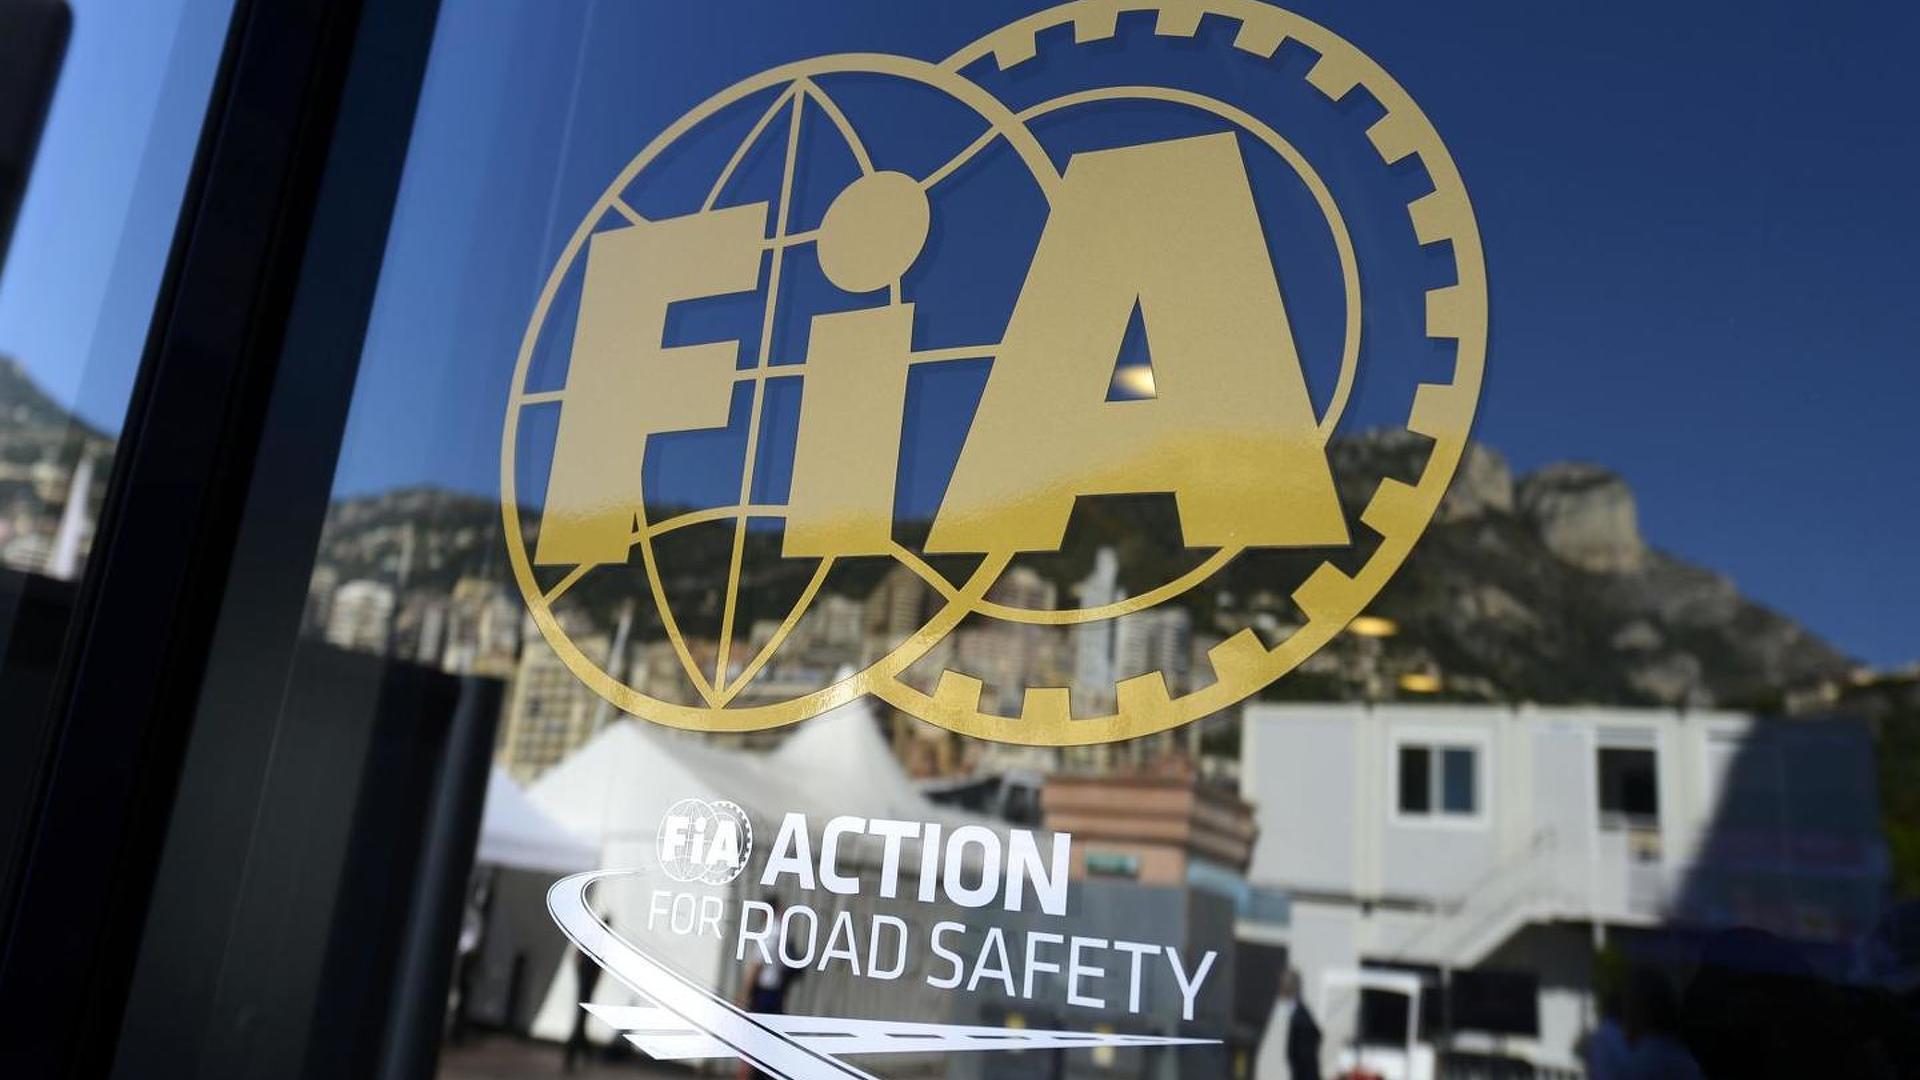 F1 in image struggle at start of new season